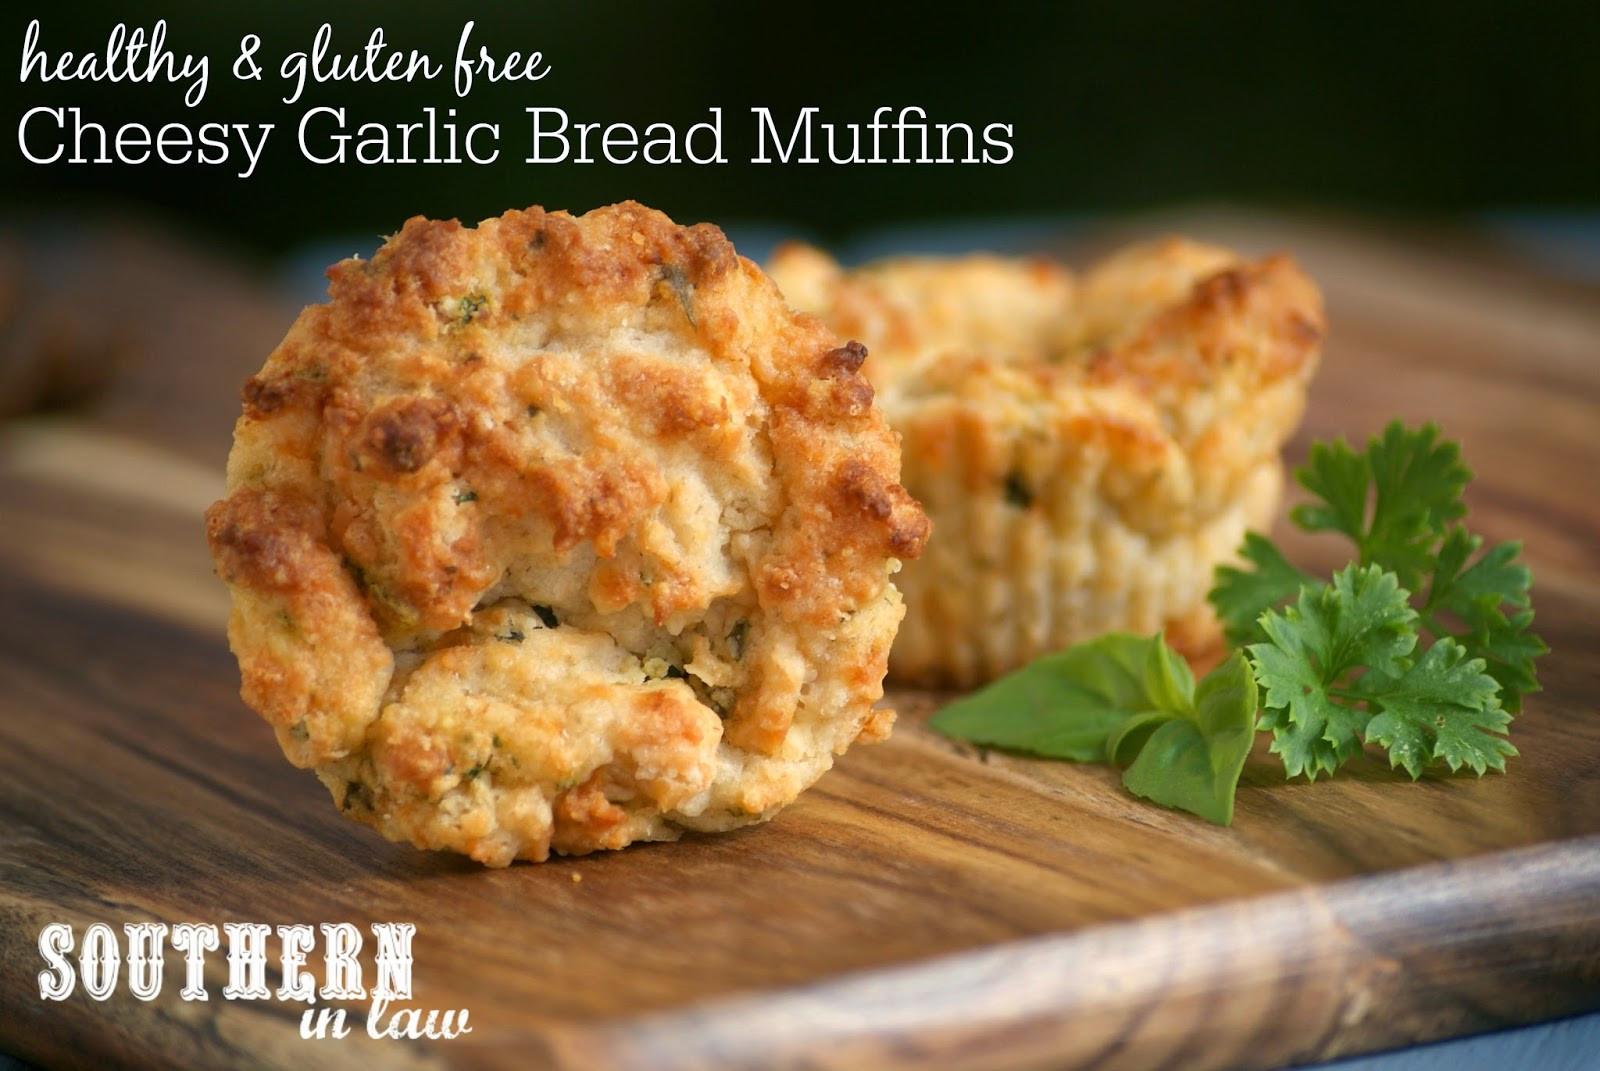 Healthy Garlic Bread Recipe  Southern In Law Recipe Cheesy Garlic Bread Muffins